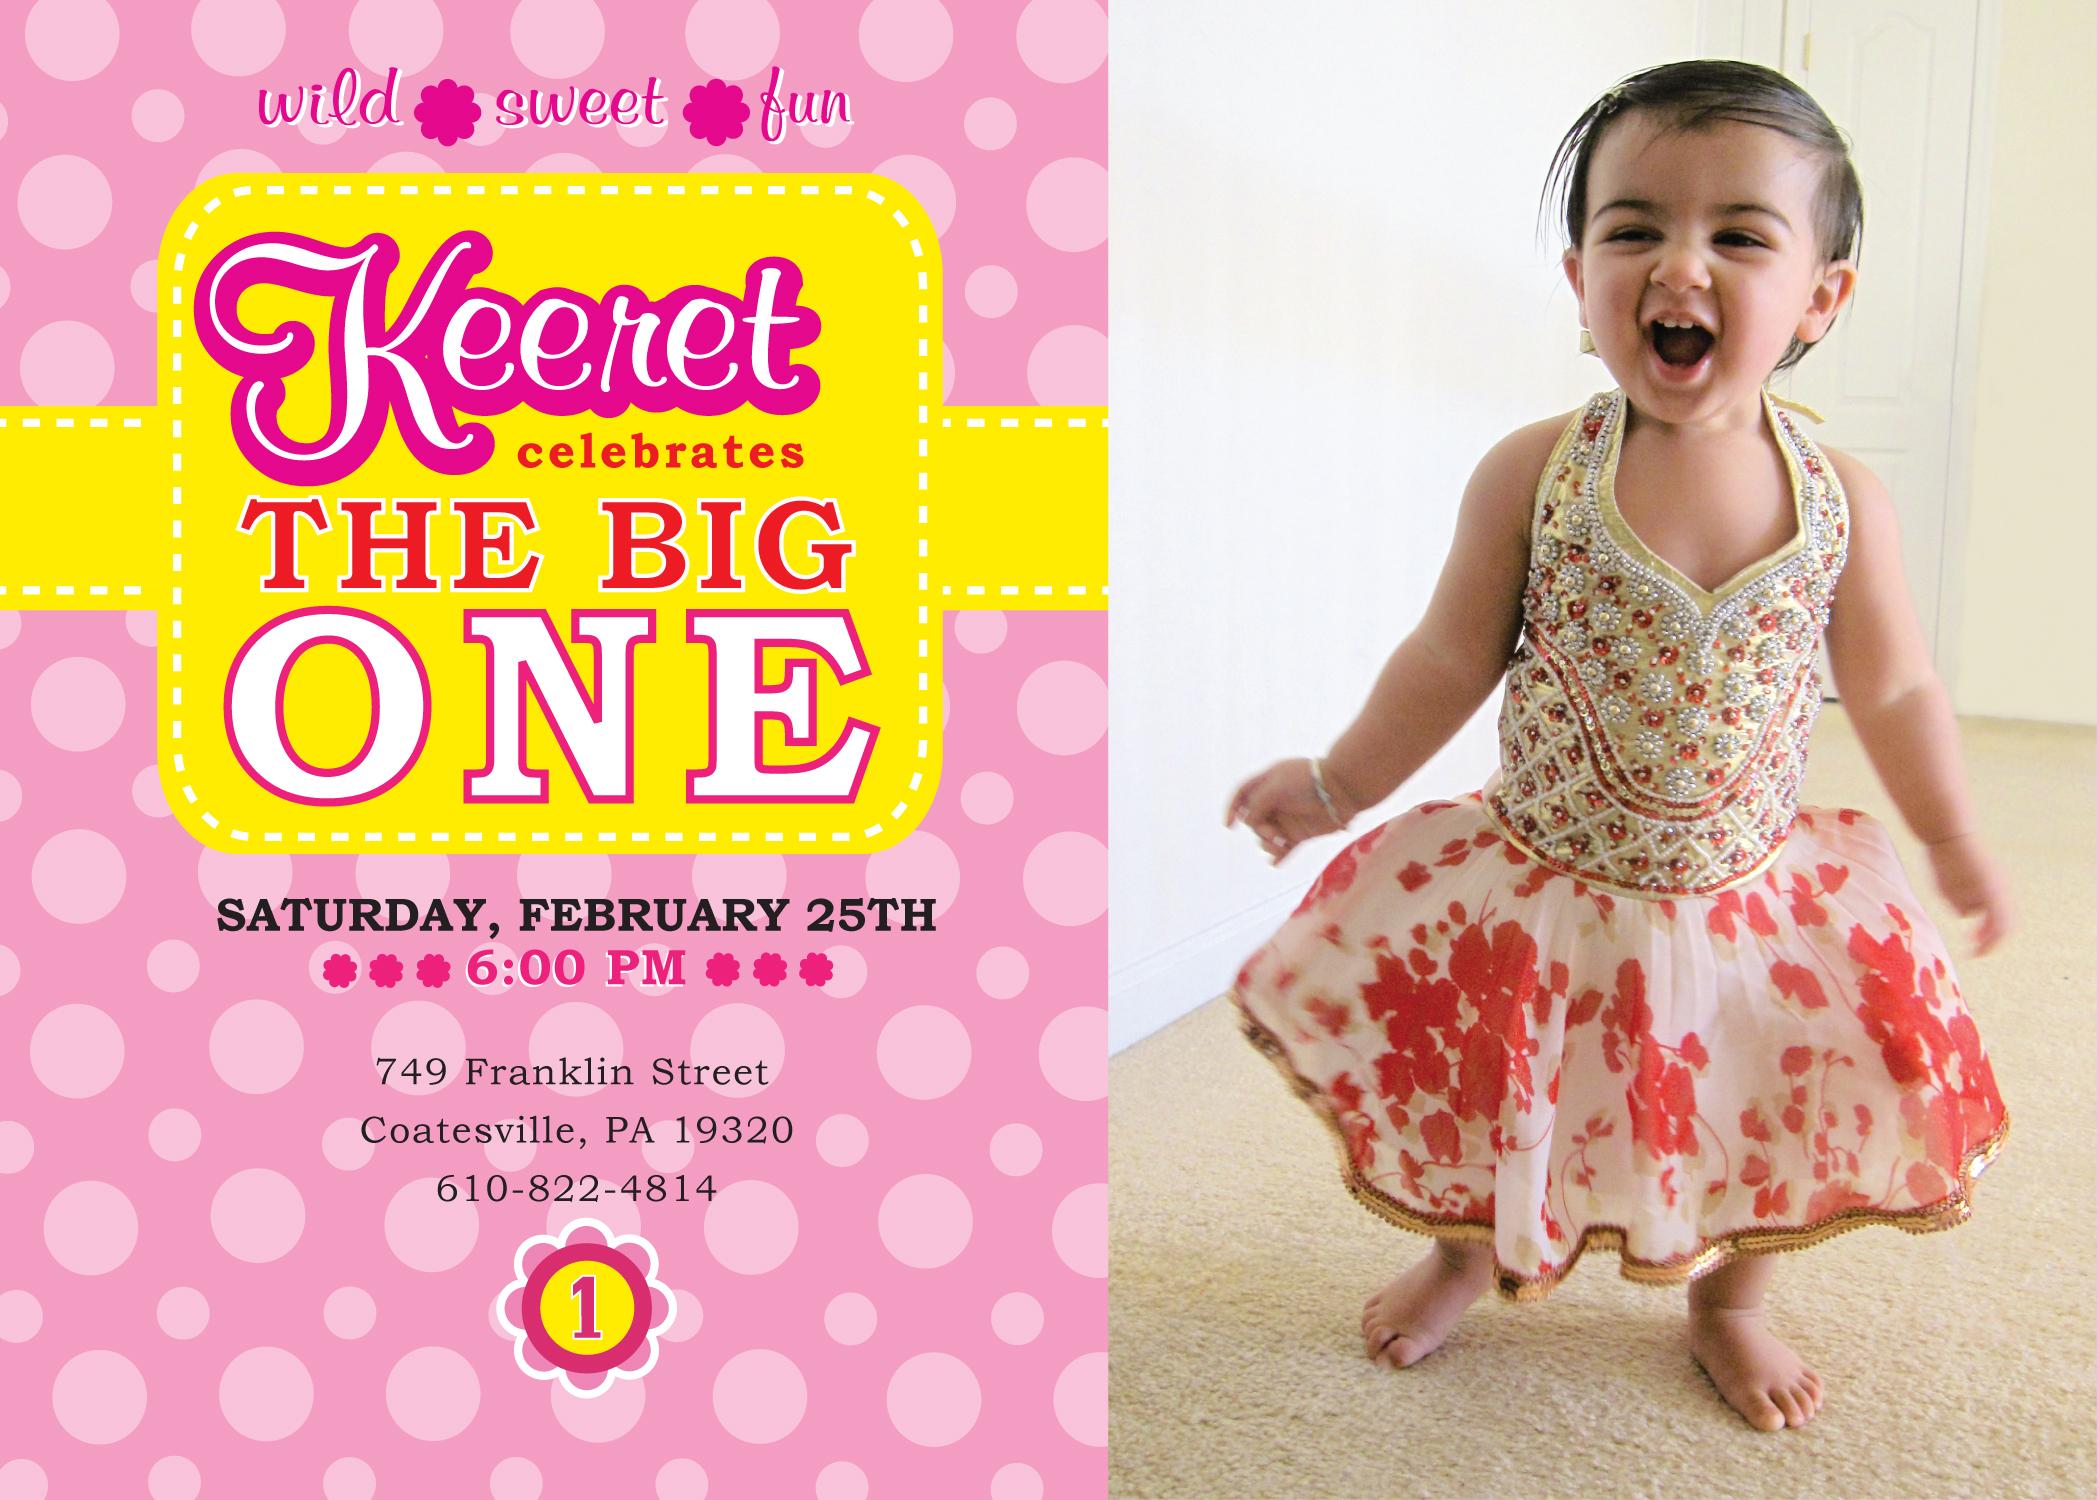 Keeret_1stBdayinvite.jpg